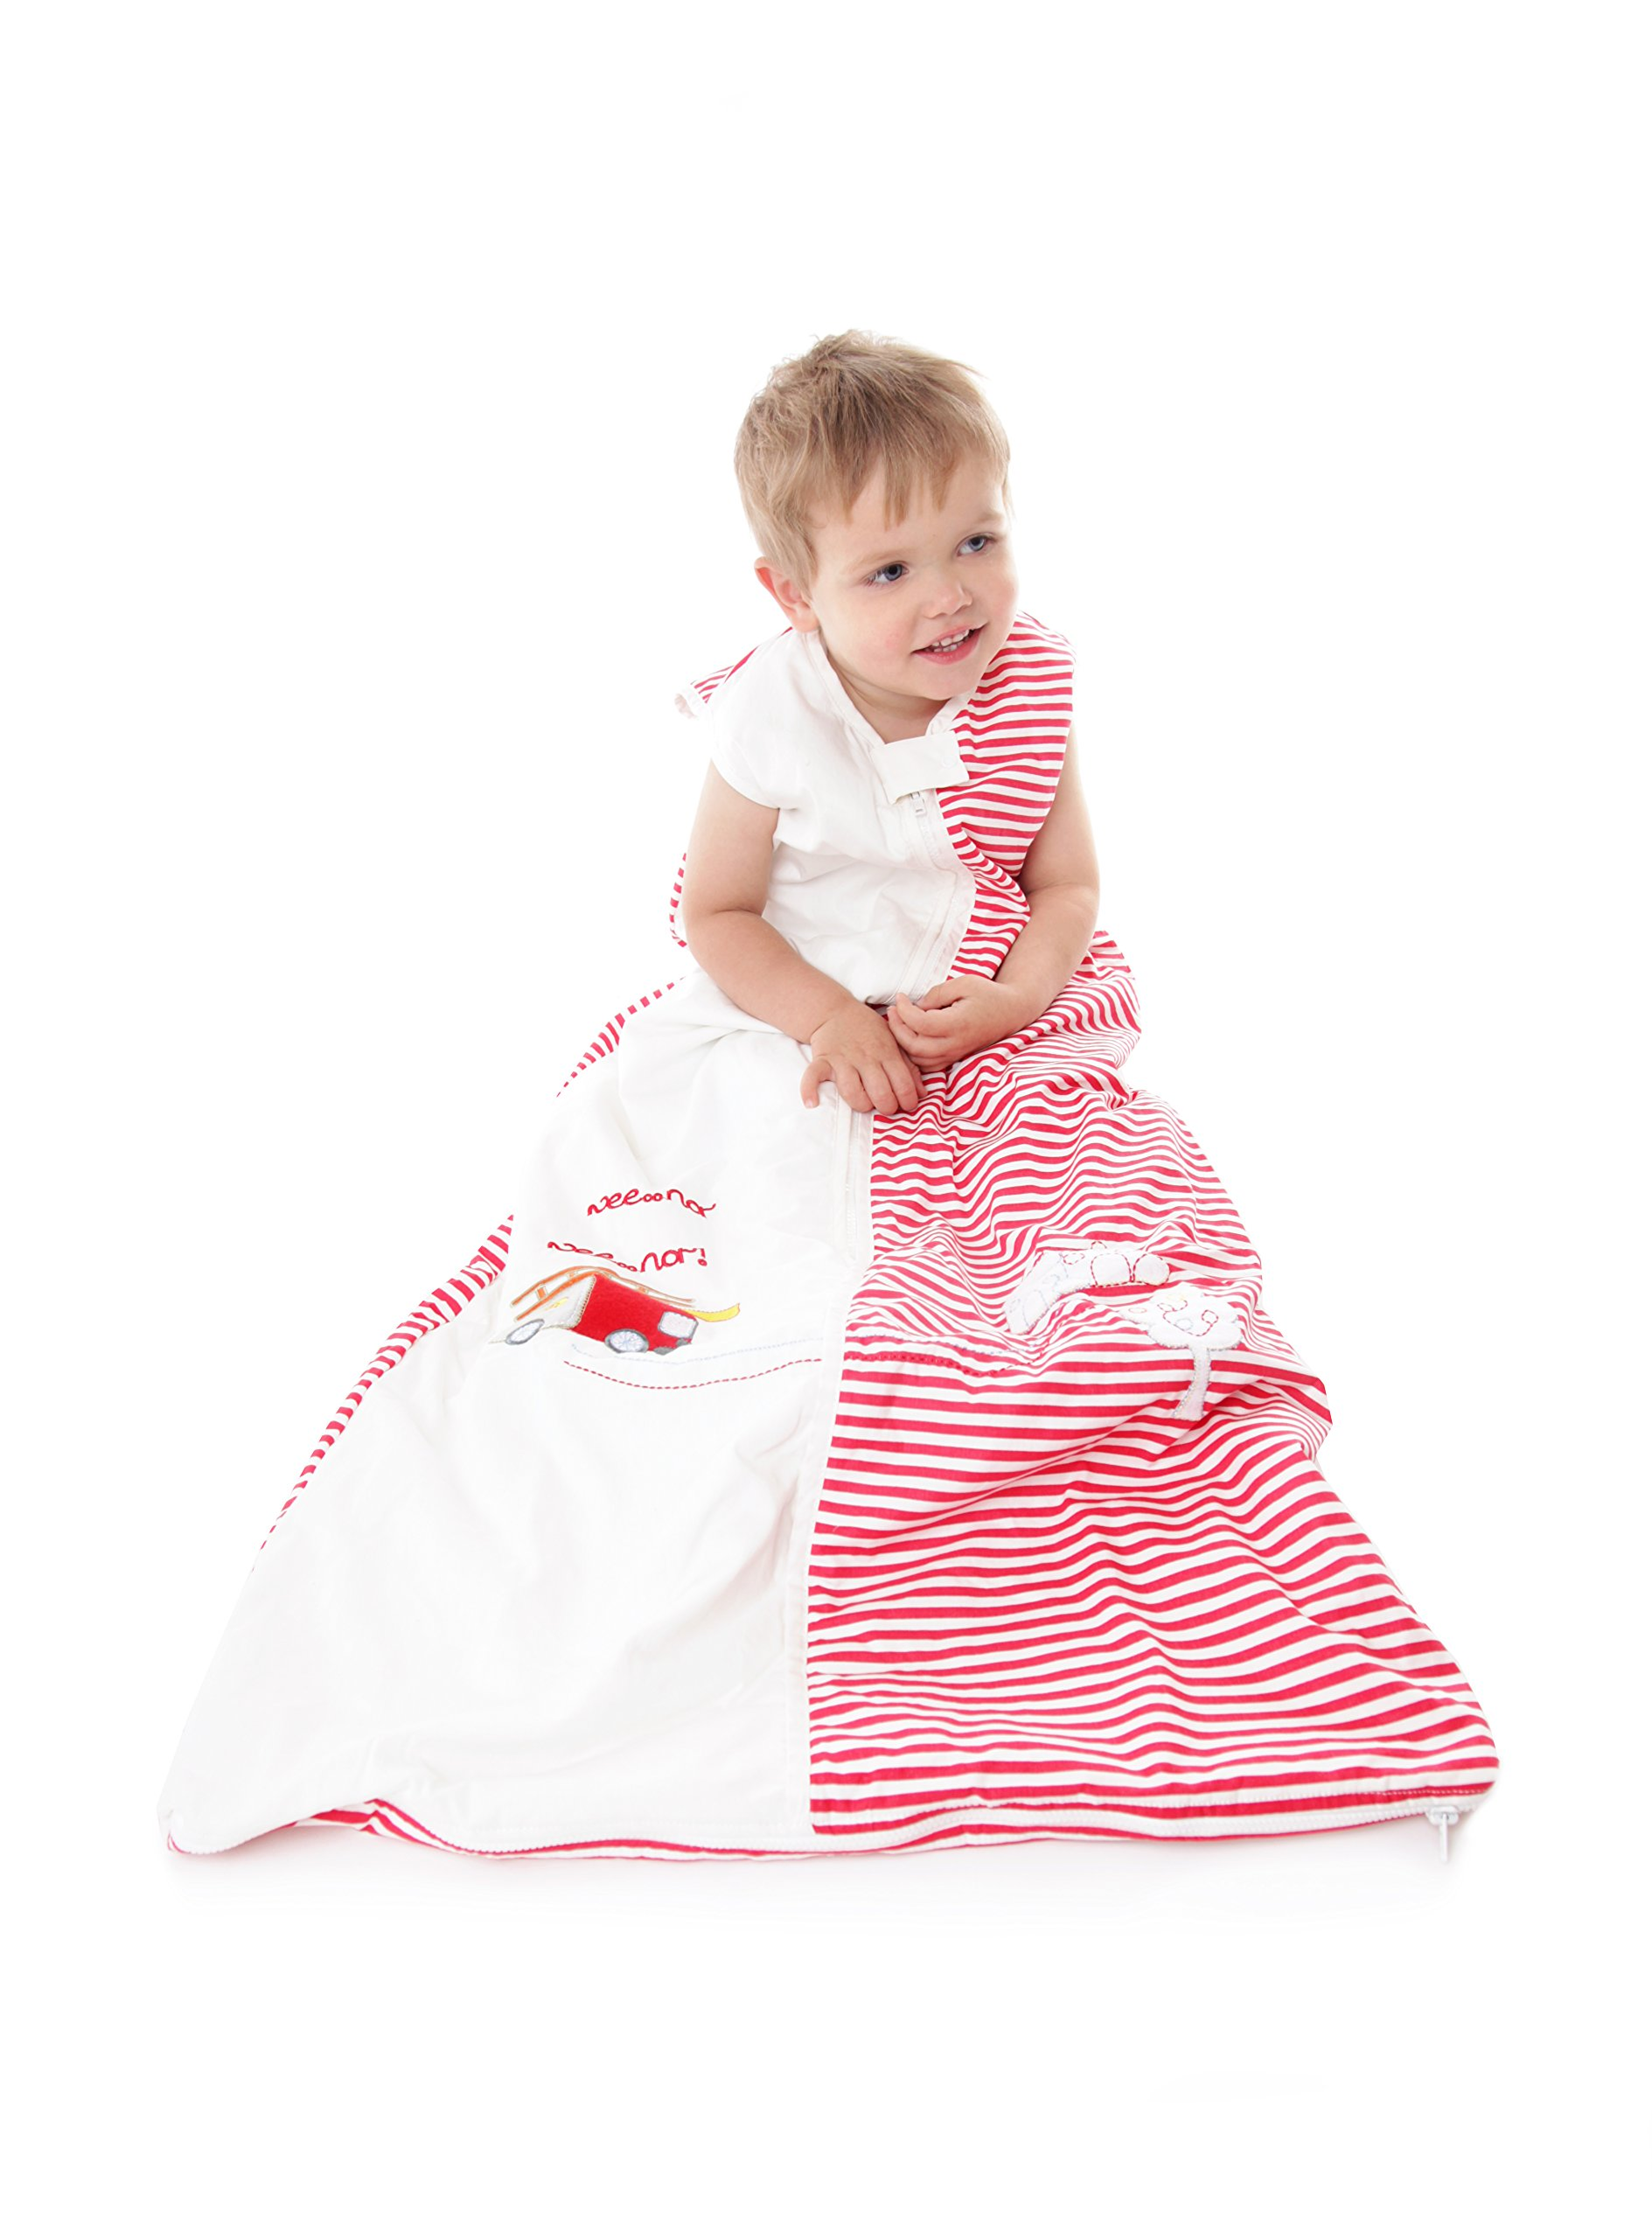 Slumbersafe Toddler Sleeping Bag 2.5 Tog - Fire Engine, 18-36 months/LARGE